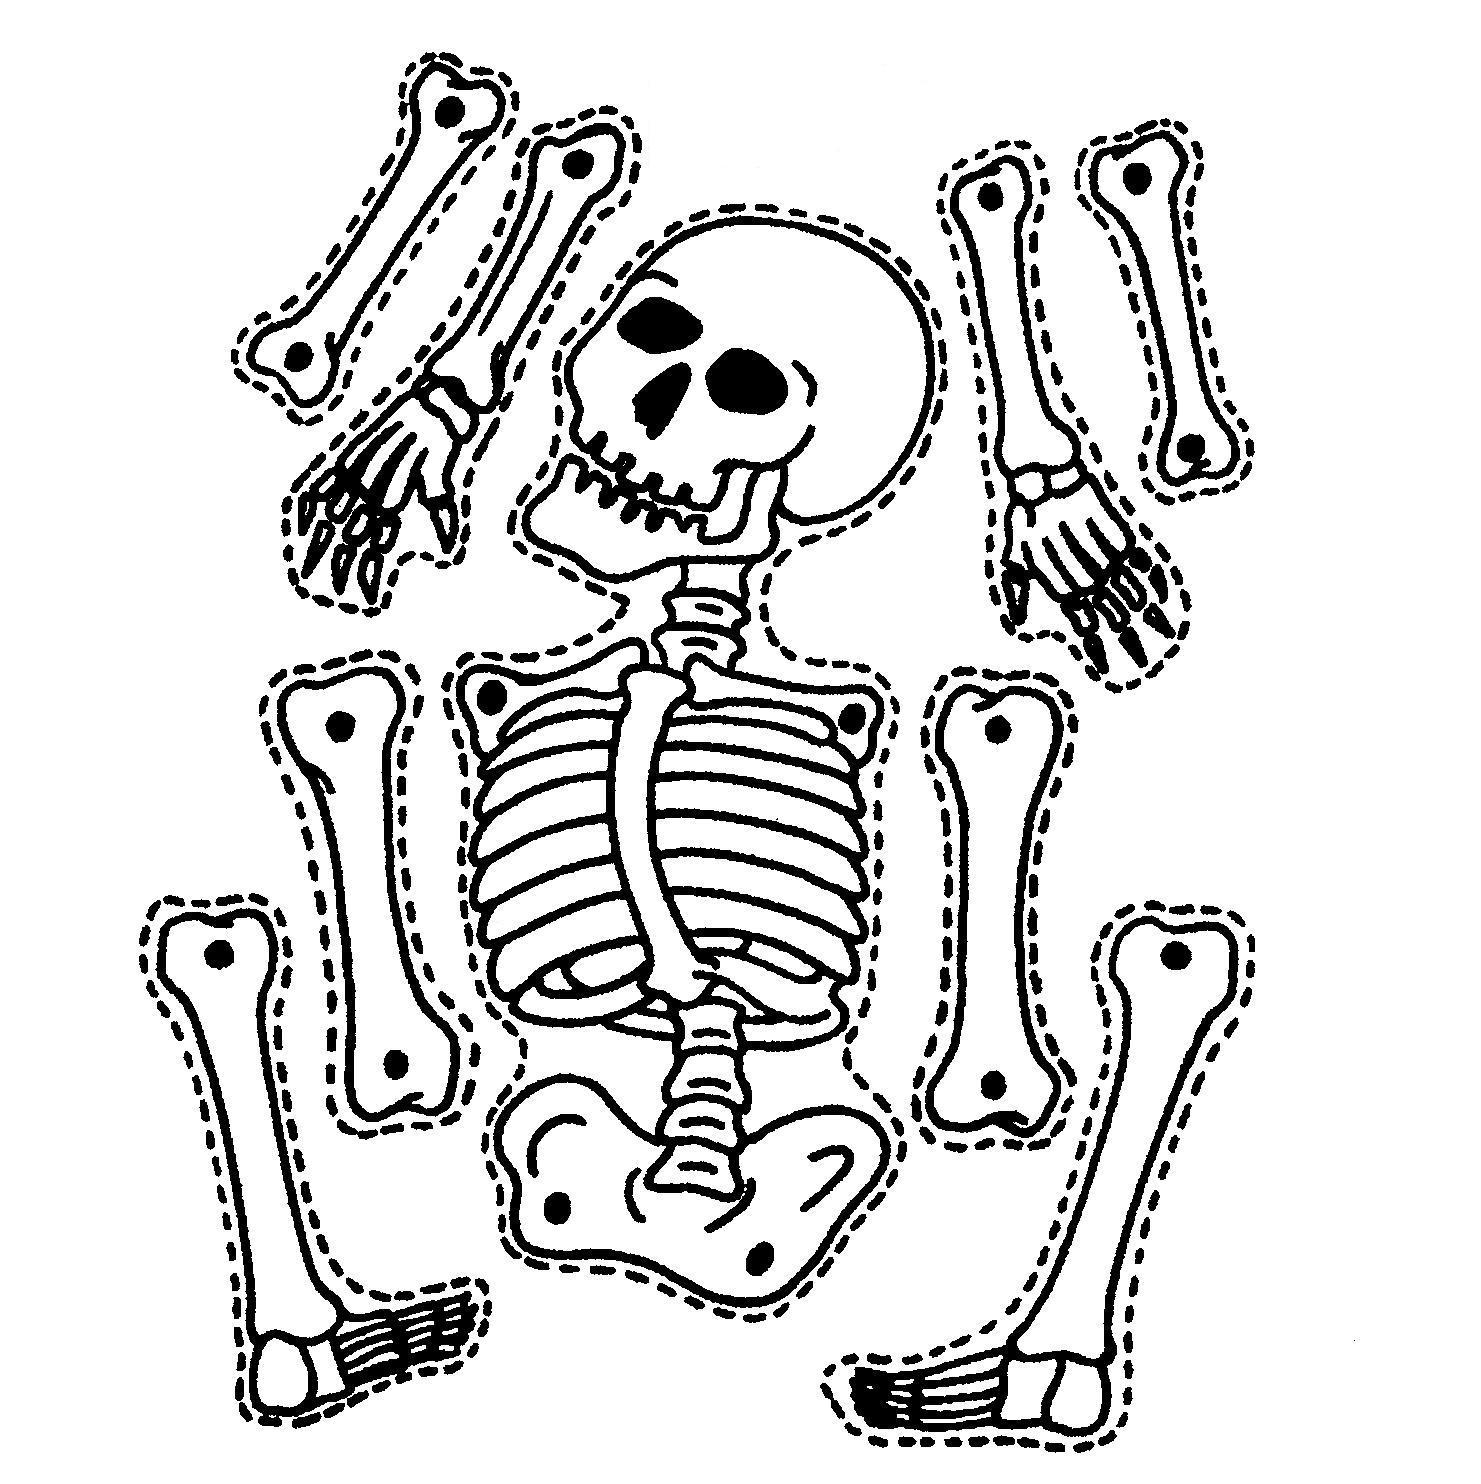 Skeletal hand drawing at. Bones clipart skeleton